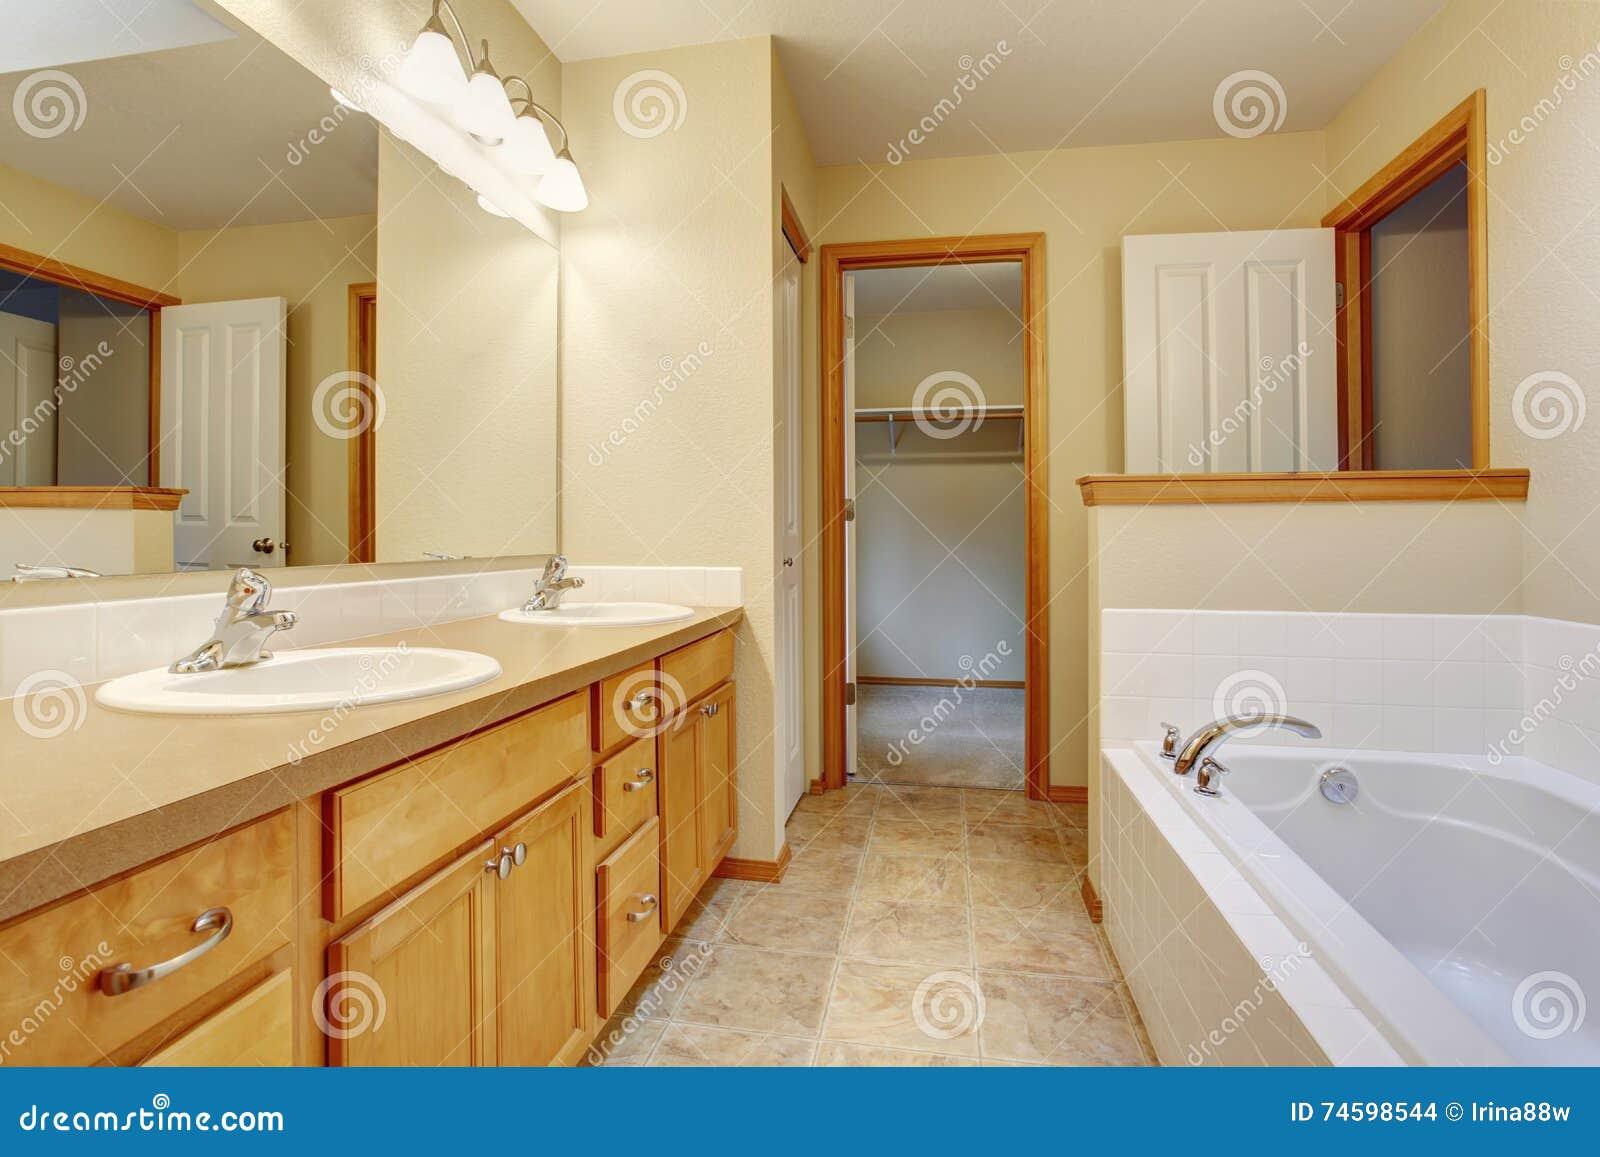 Vasca Da Bagno E Lavandino : Vasca da bagno toilette e lavandino bianchi interni del bagno